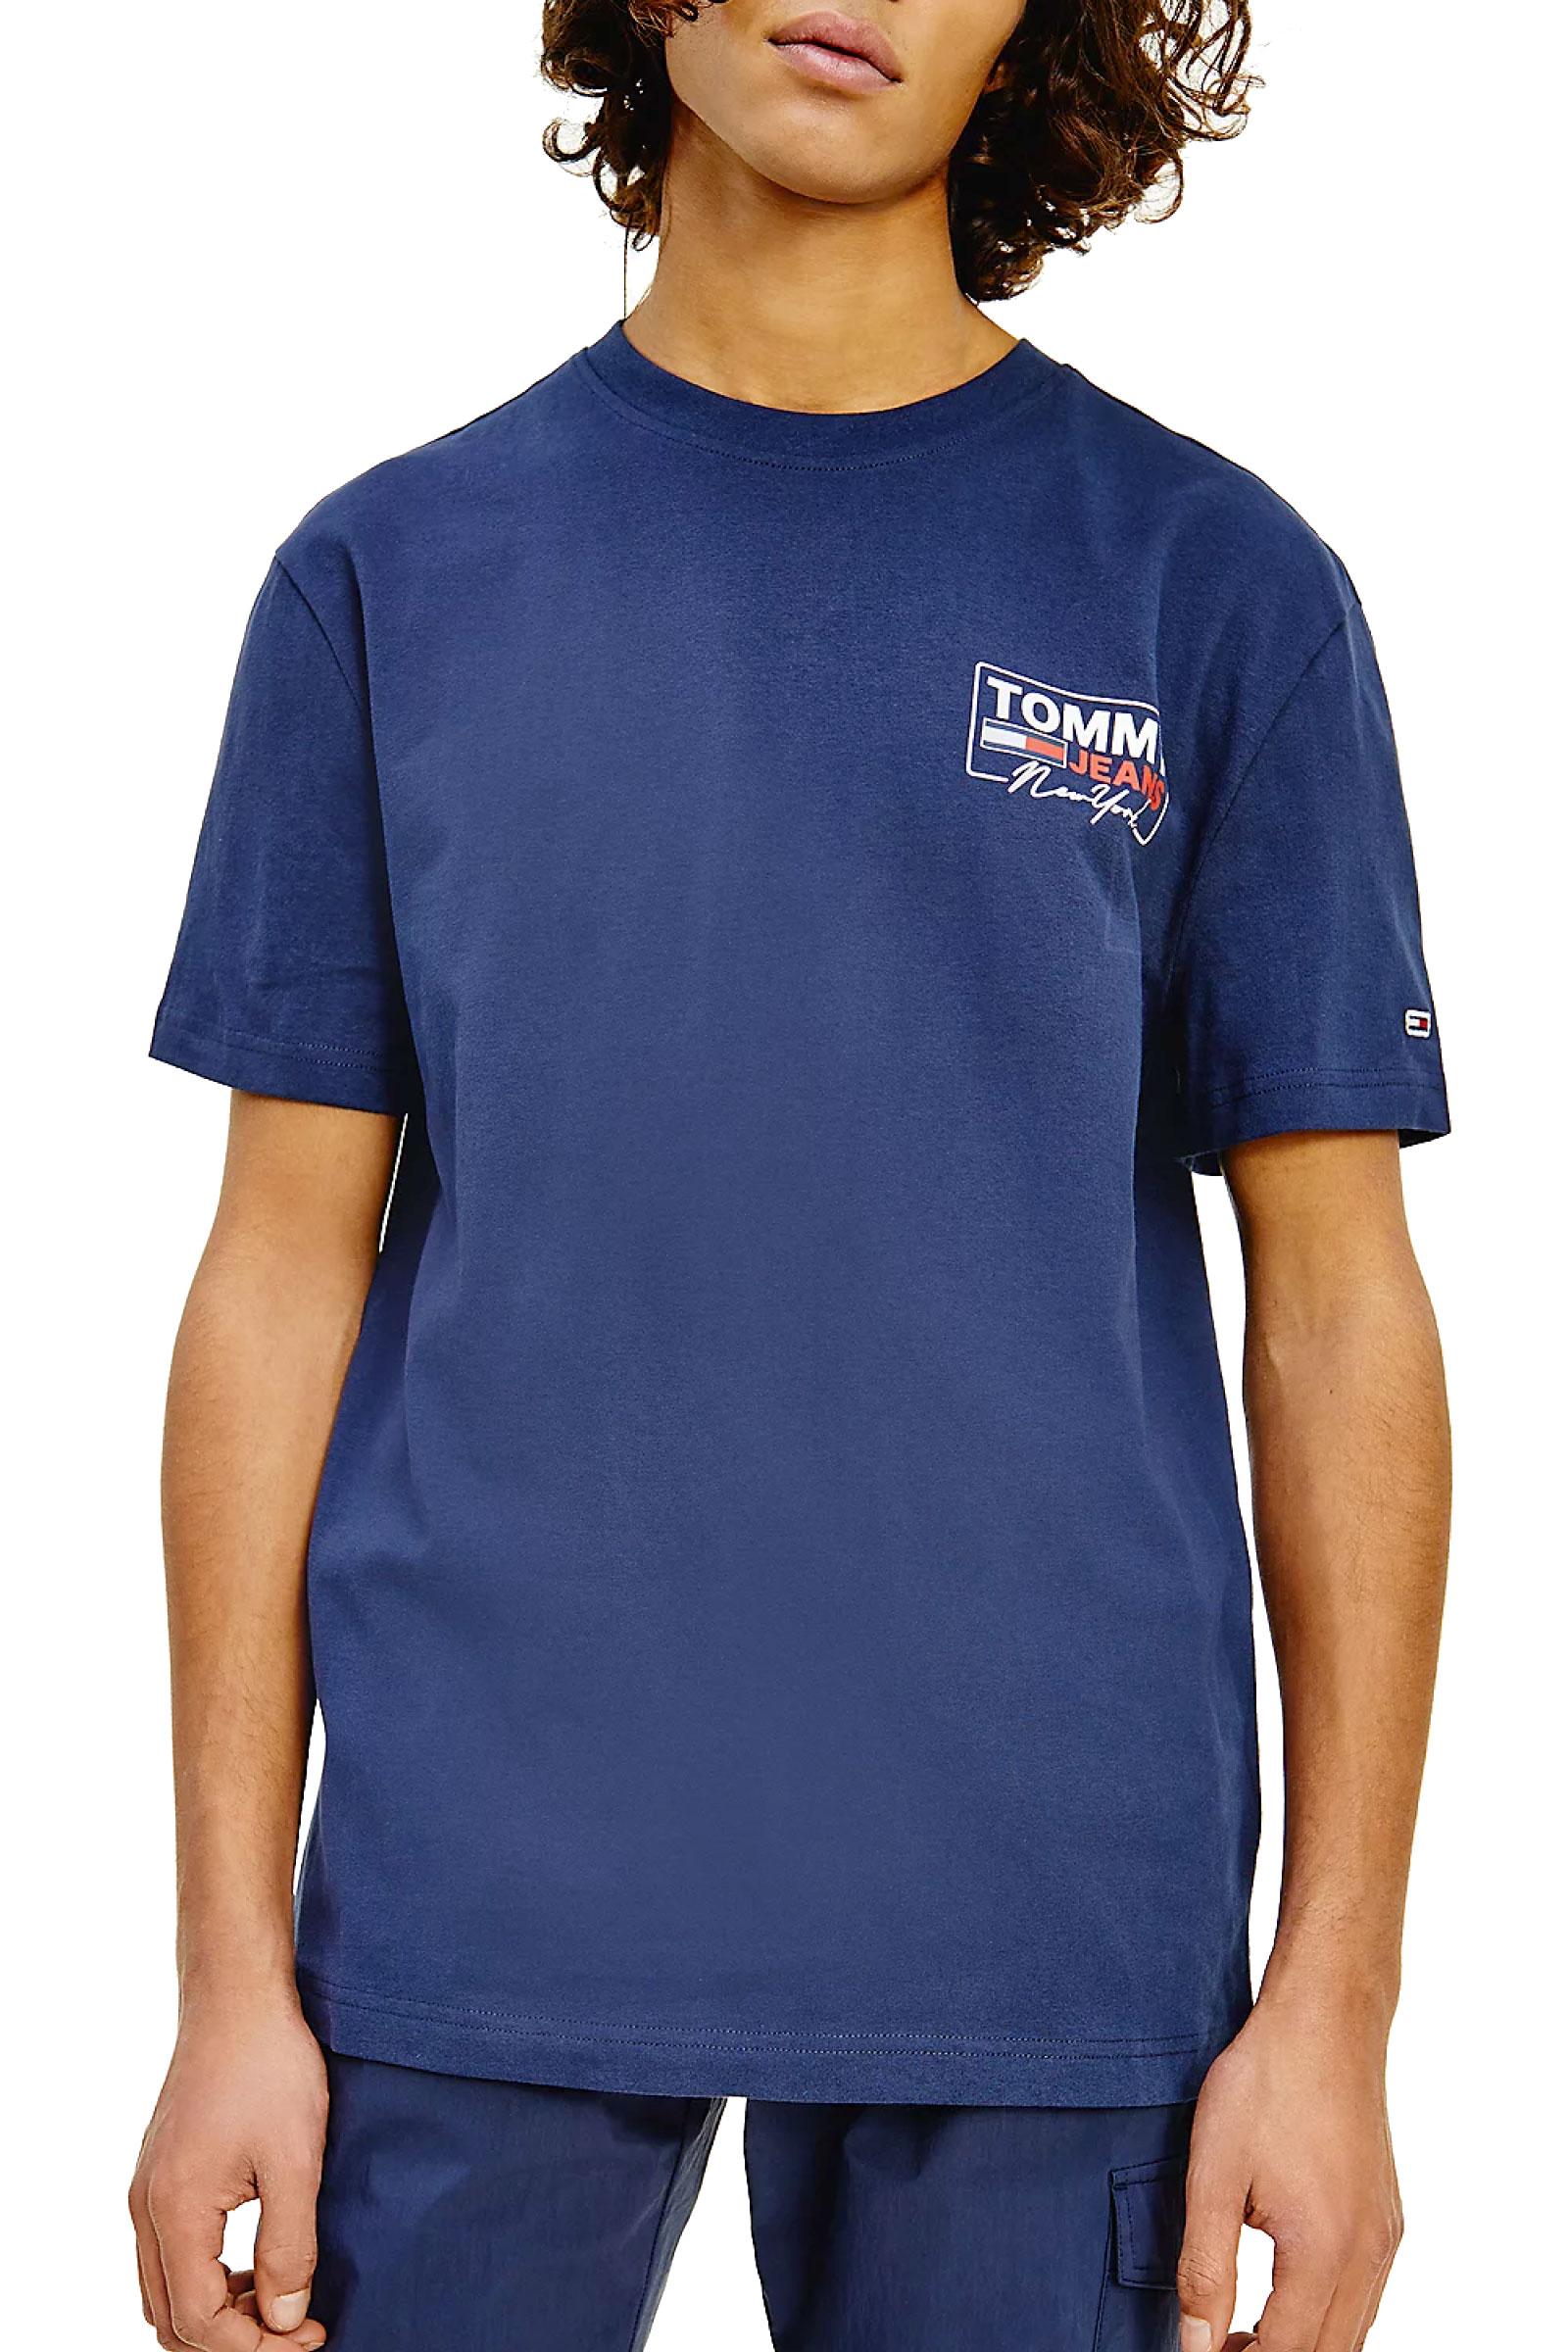 TOMMY JEANS T-Shirt Uomo TOMMY JEANS | T-Shirt | DM0DM10216C87